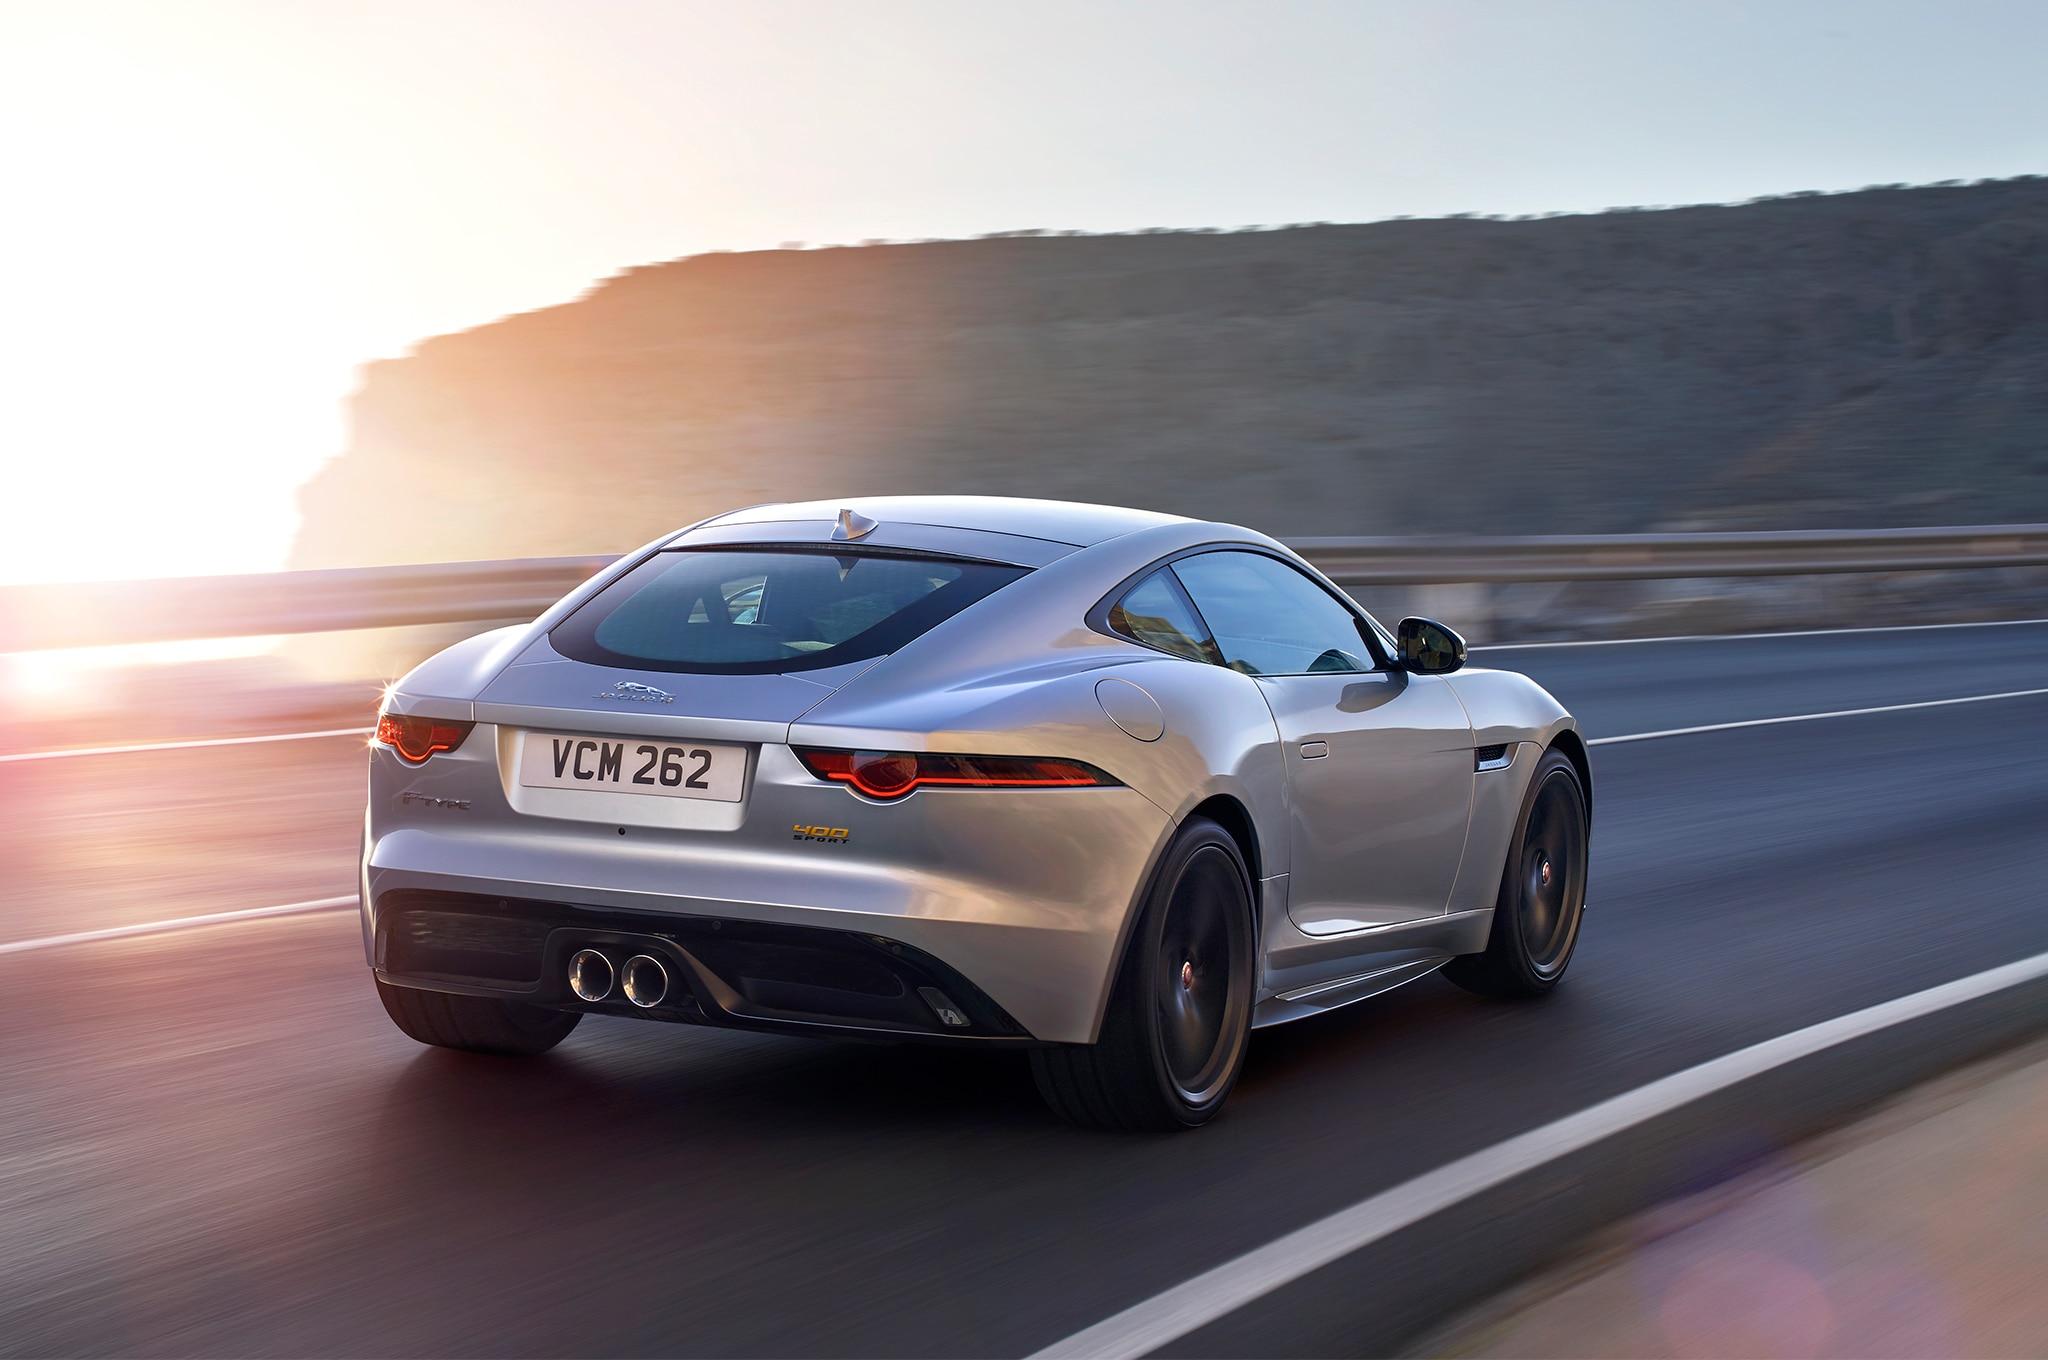 2018-Jaguar-F-Type-400-Sport-rear-three-quarter-in-motion-9